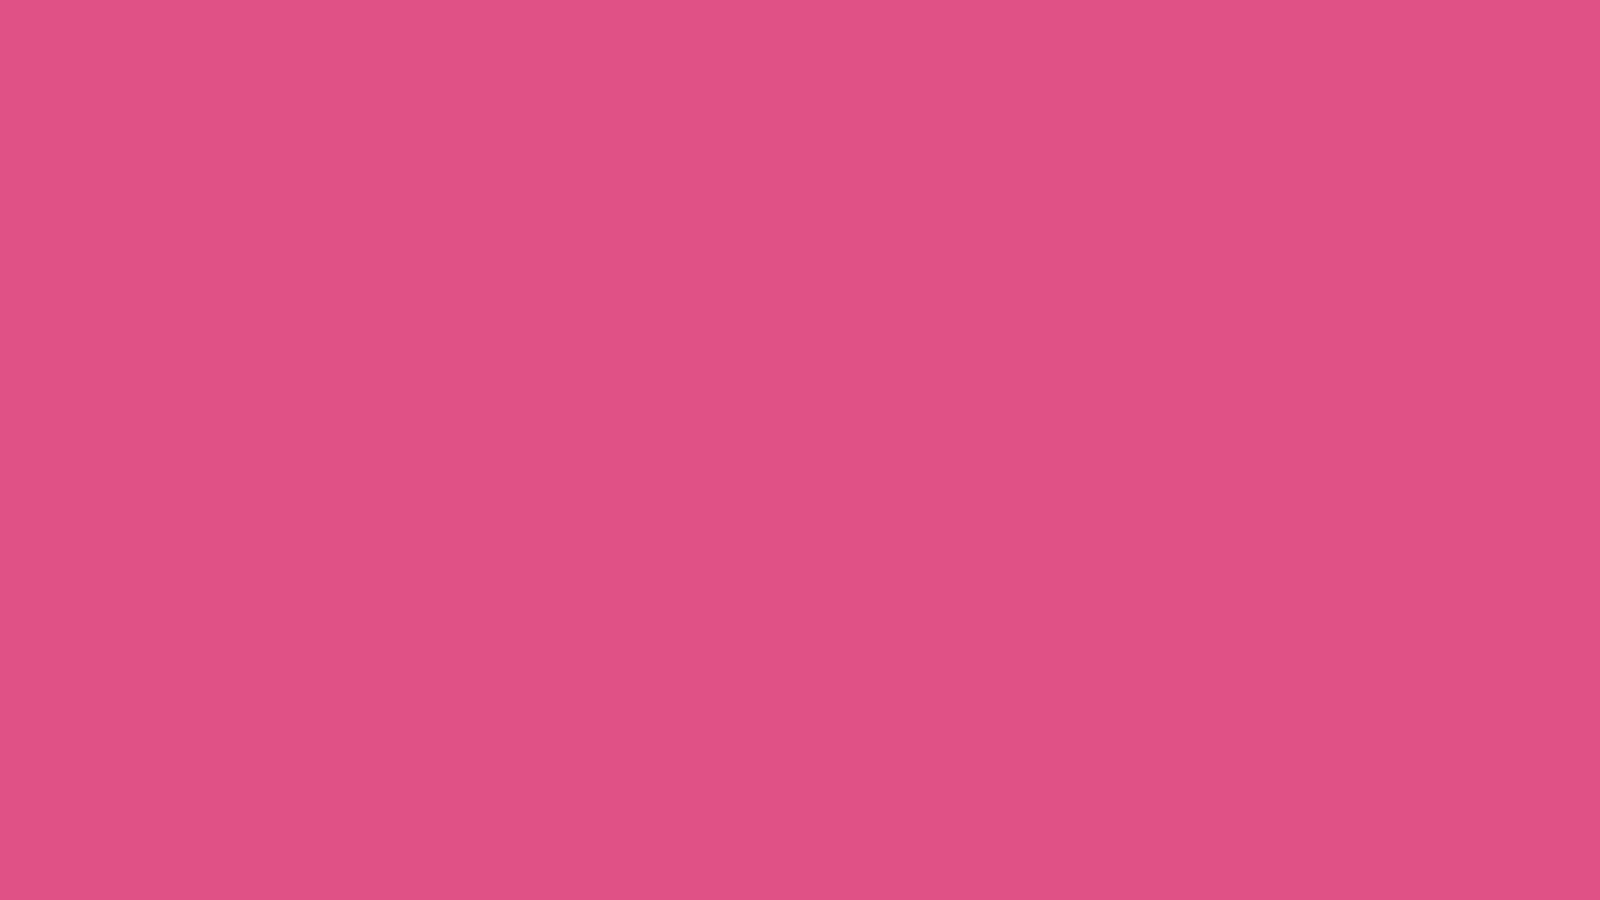 1600x900 Fandango Pink Solid Color Background